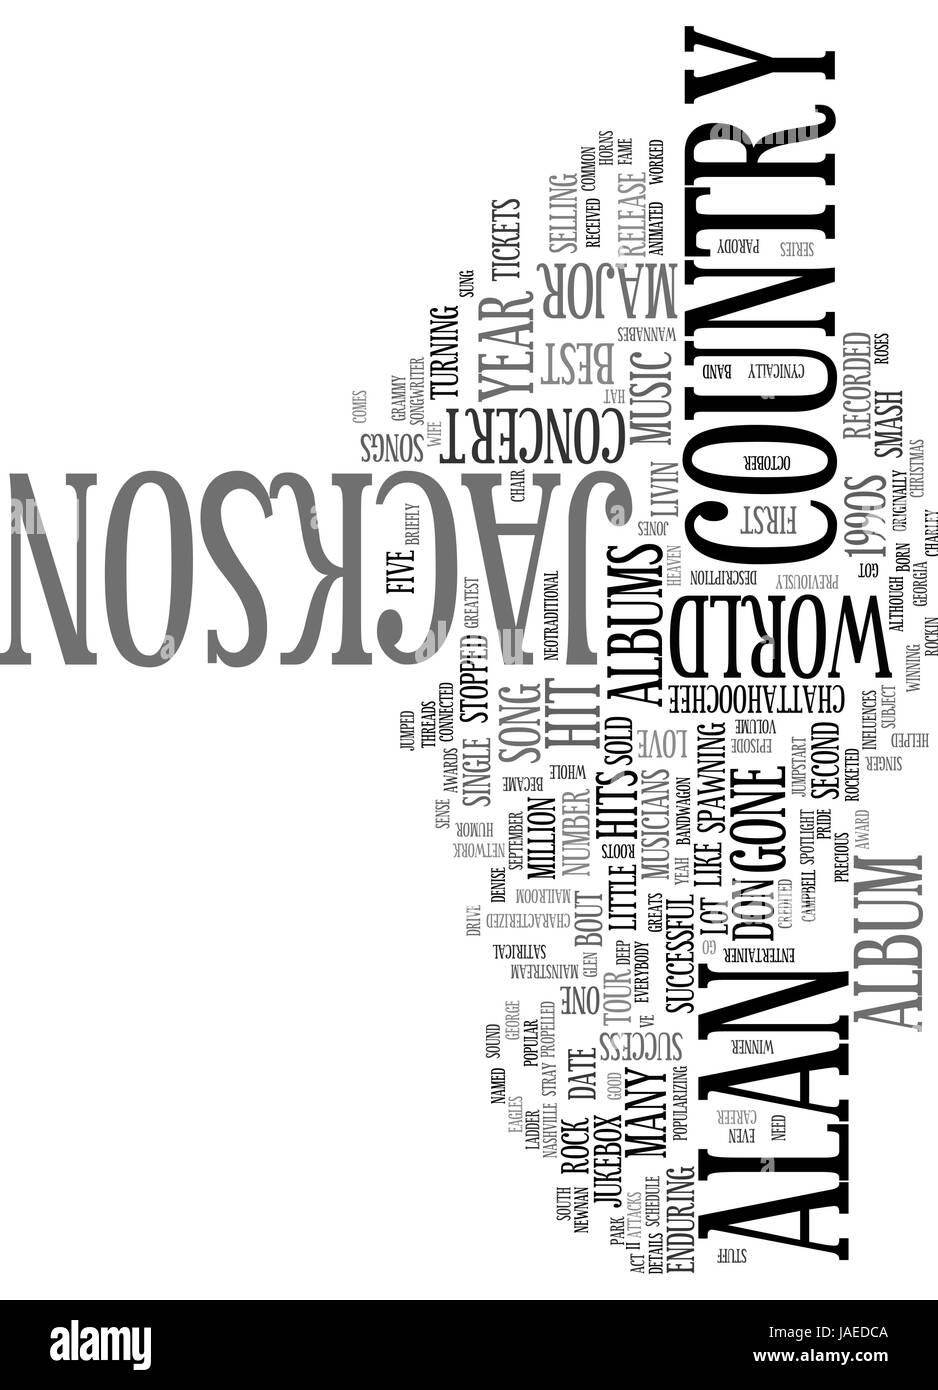 ALAN JACKSON CONCERT DETAILS TEXT WORD CLOUD CONCEPT - Stock Vector